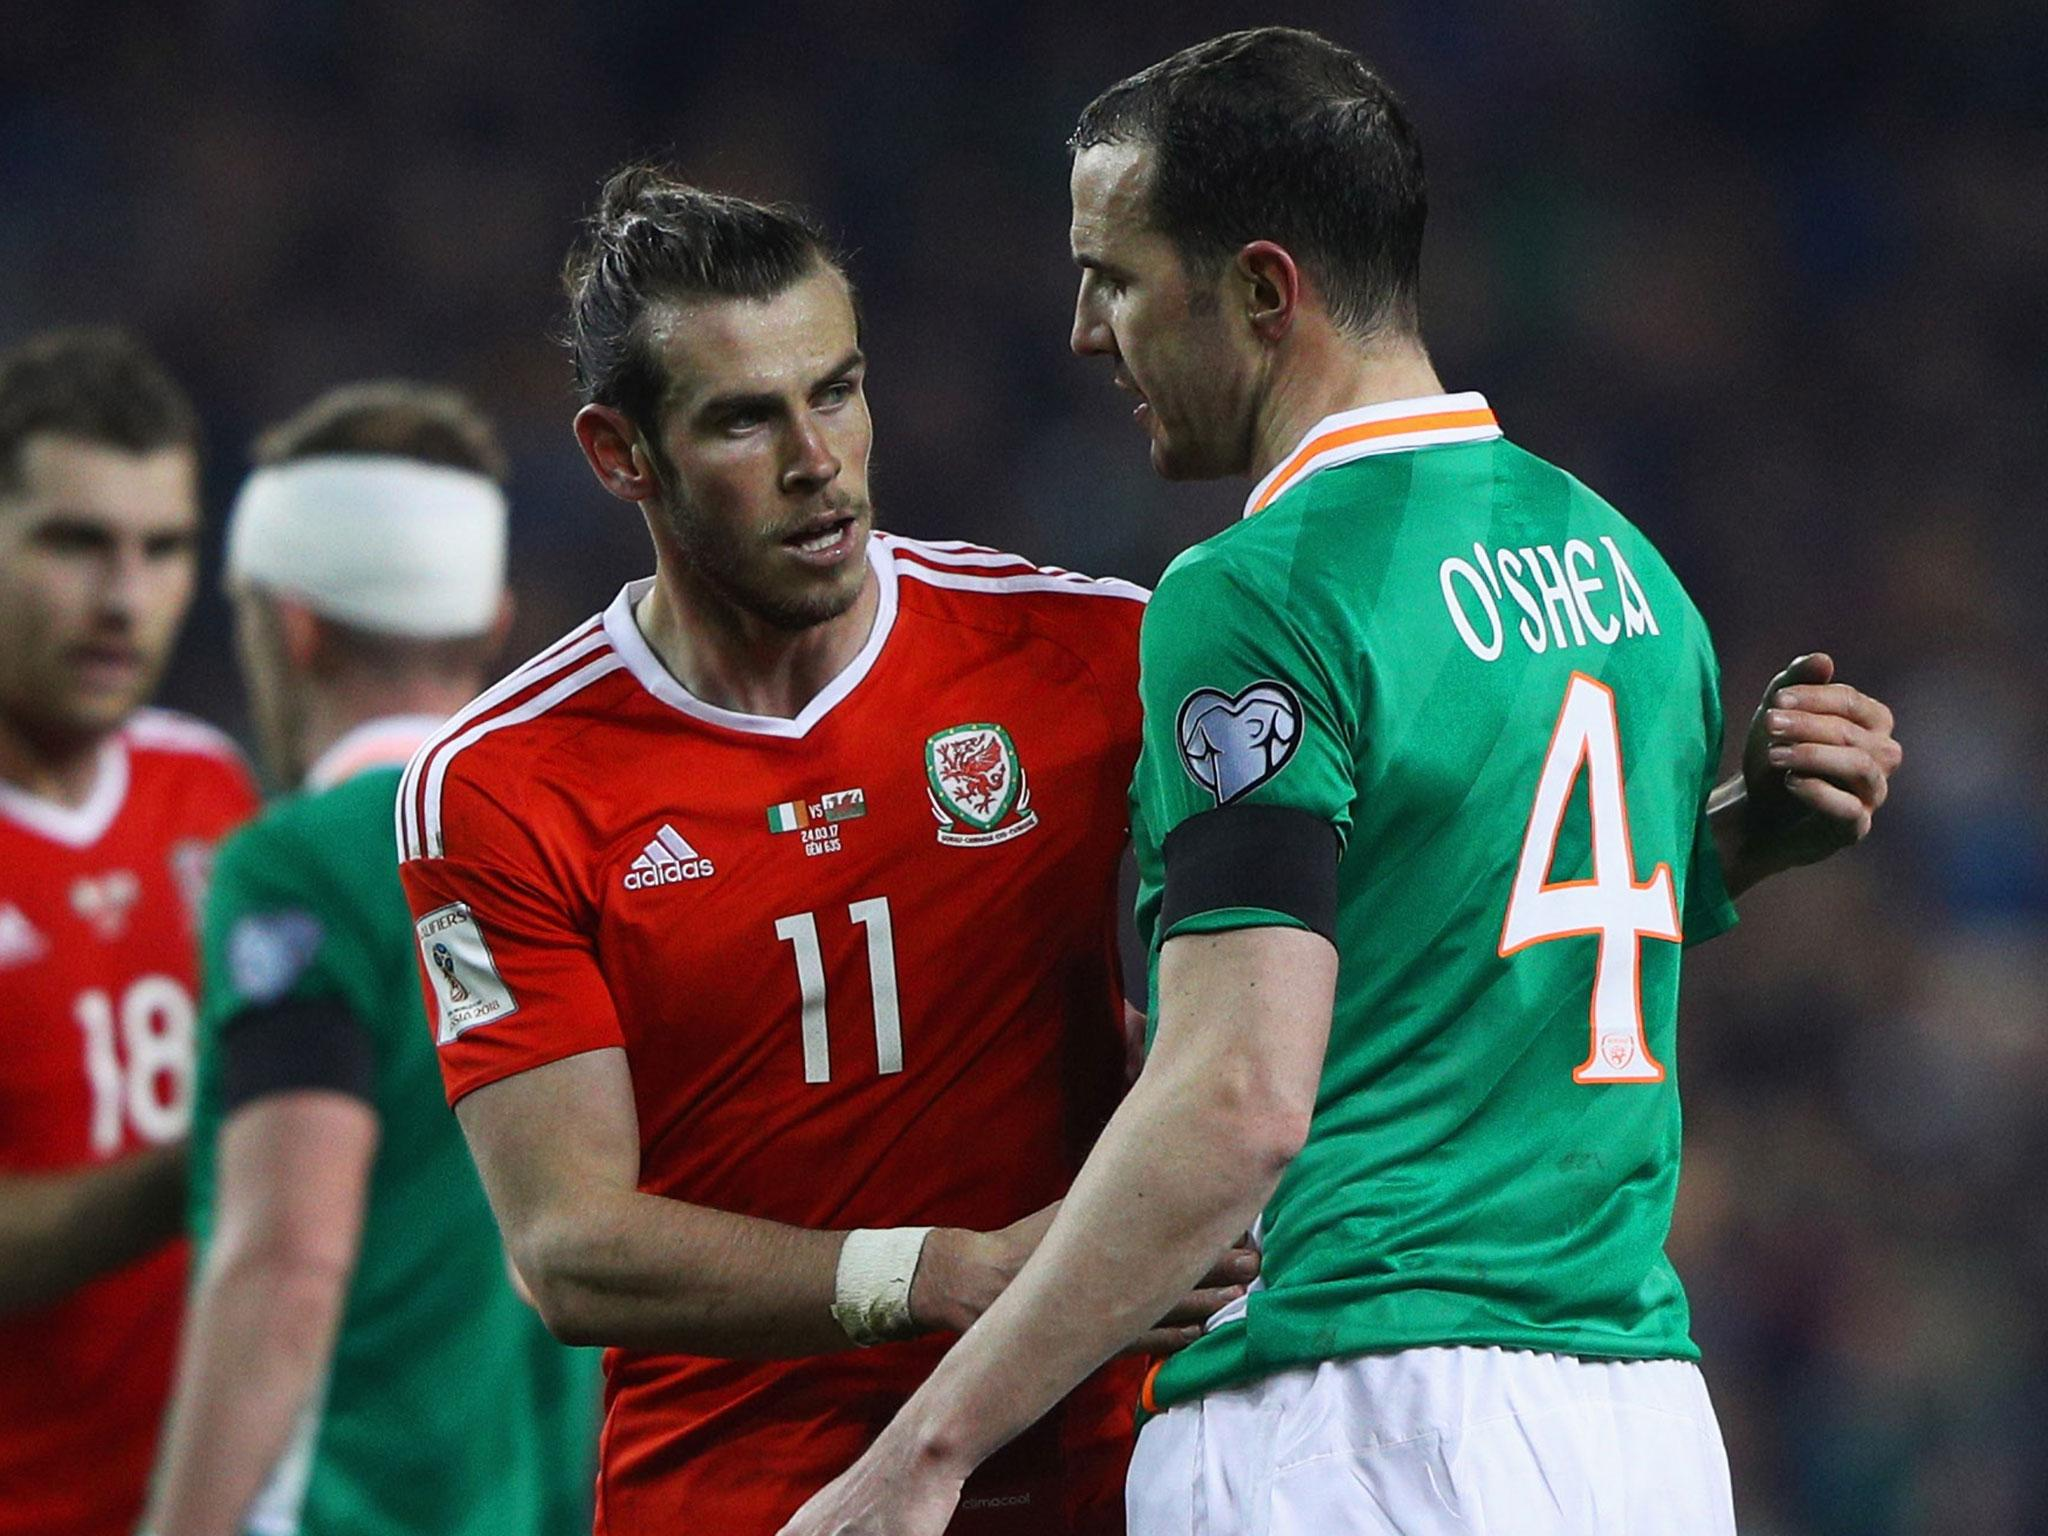 eab419295c6 Google News - Wales national football team - Latest